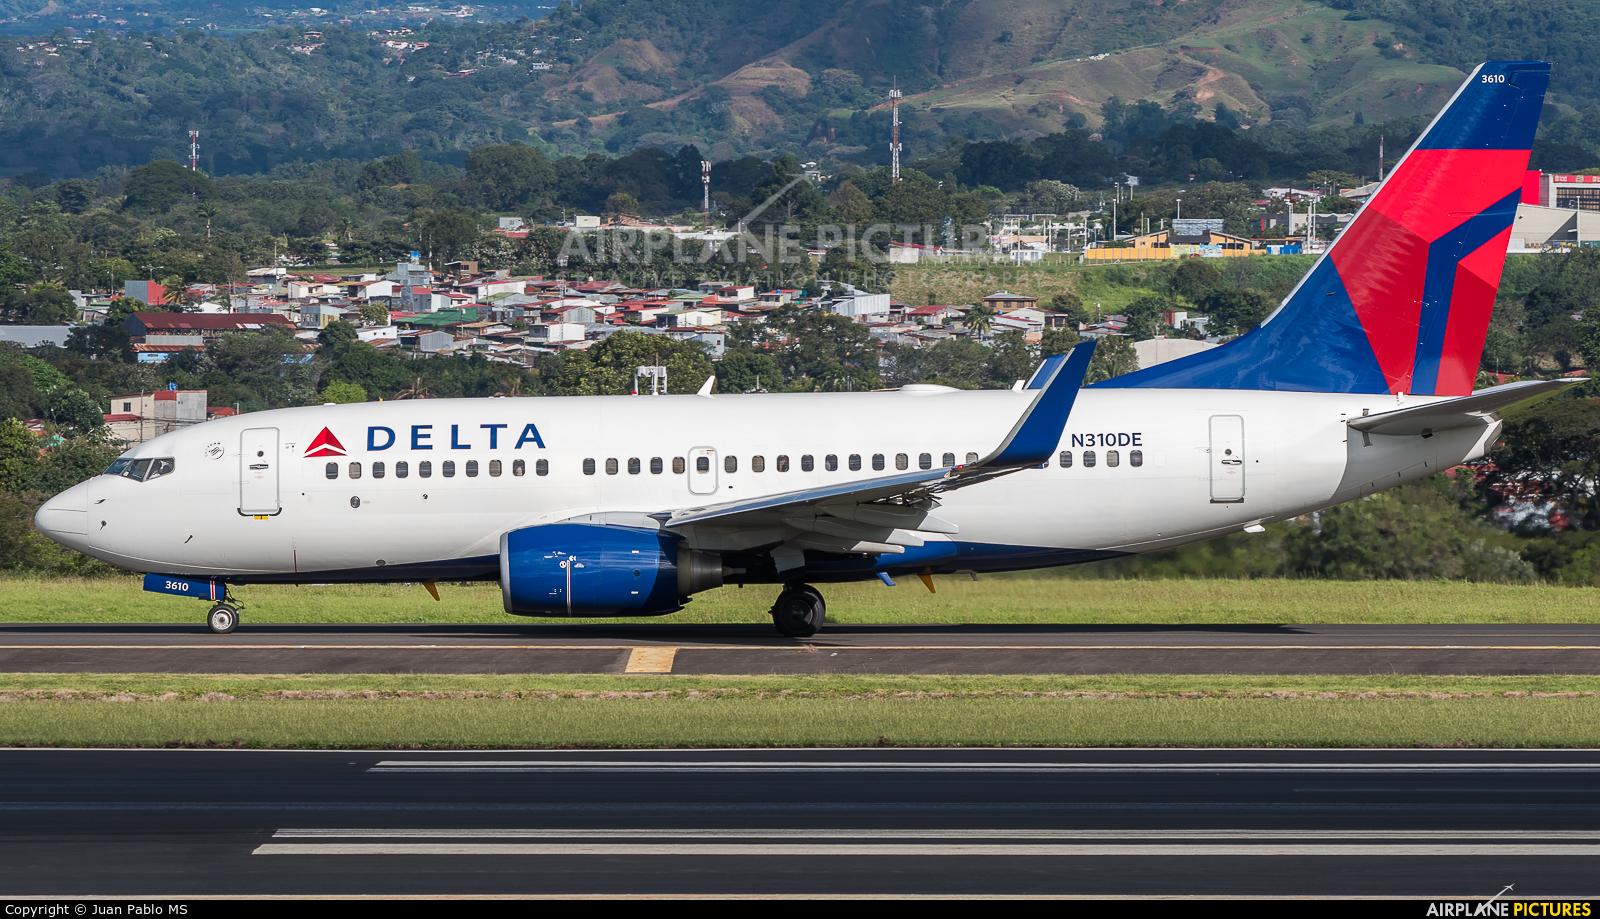 Delta Air Lines N310DE aircraft at San Jose - Juan Santamaría Intl